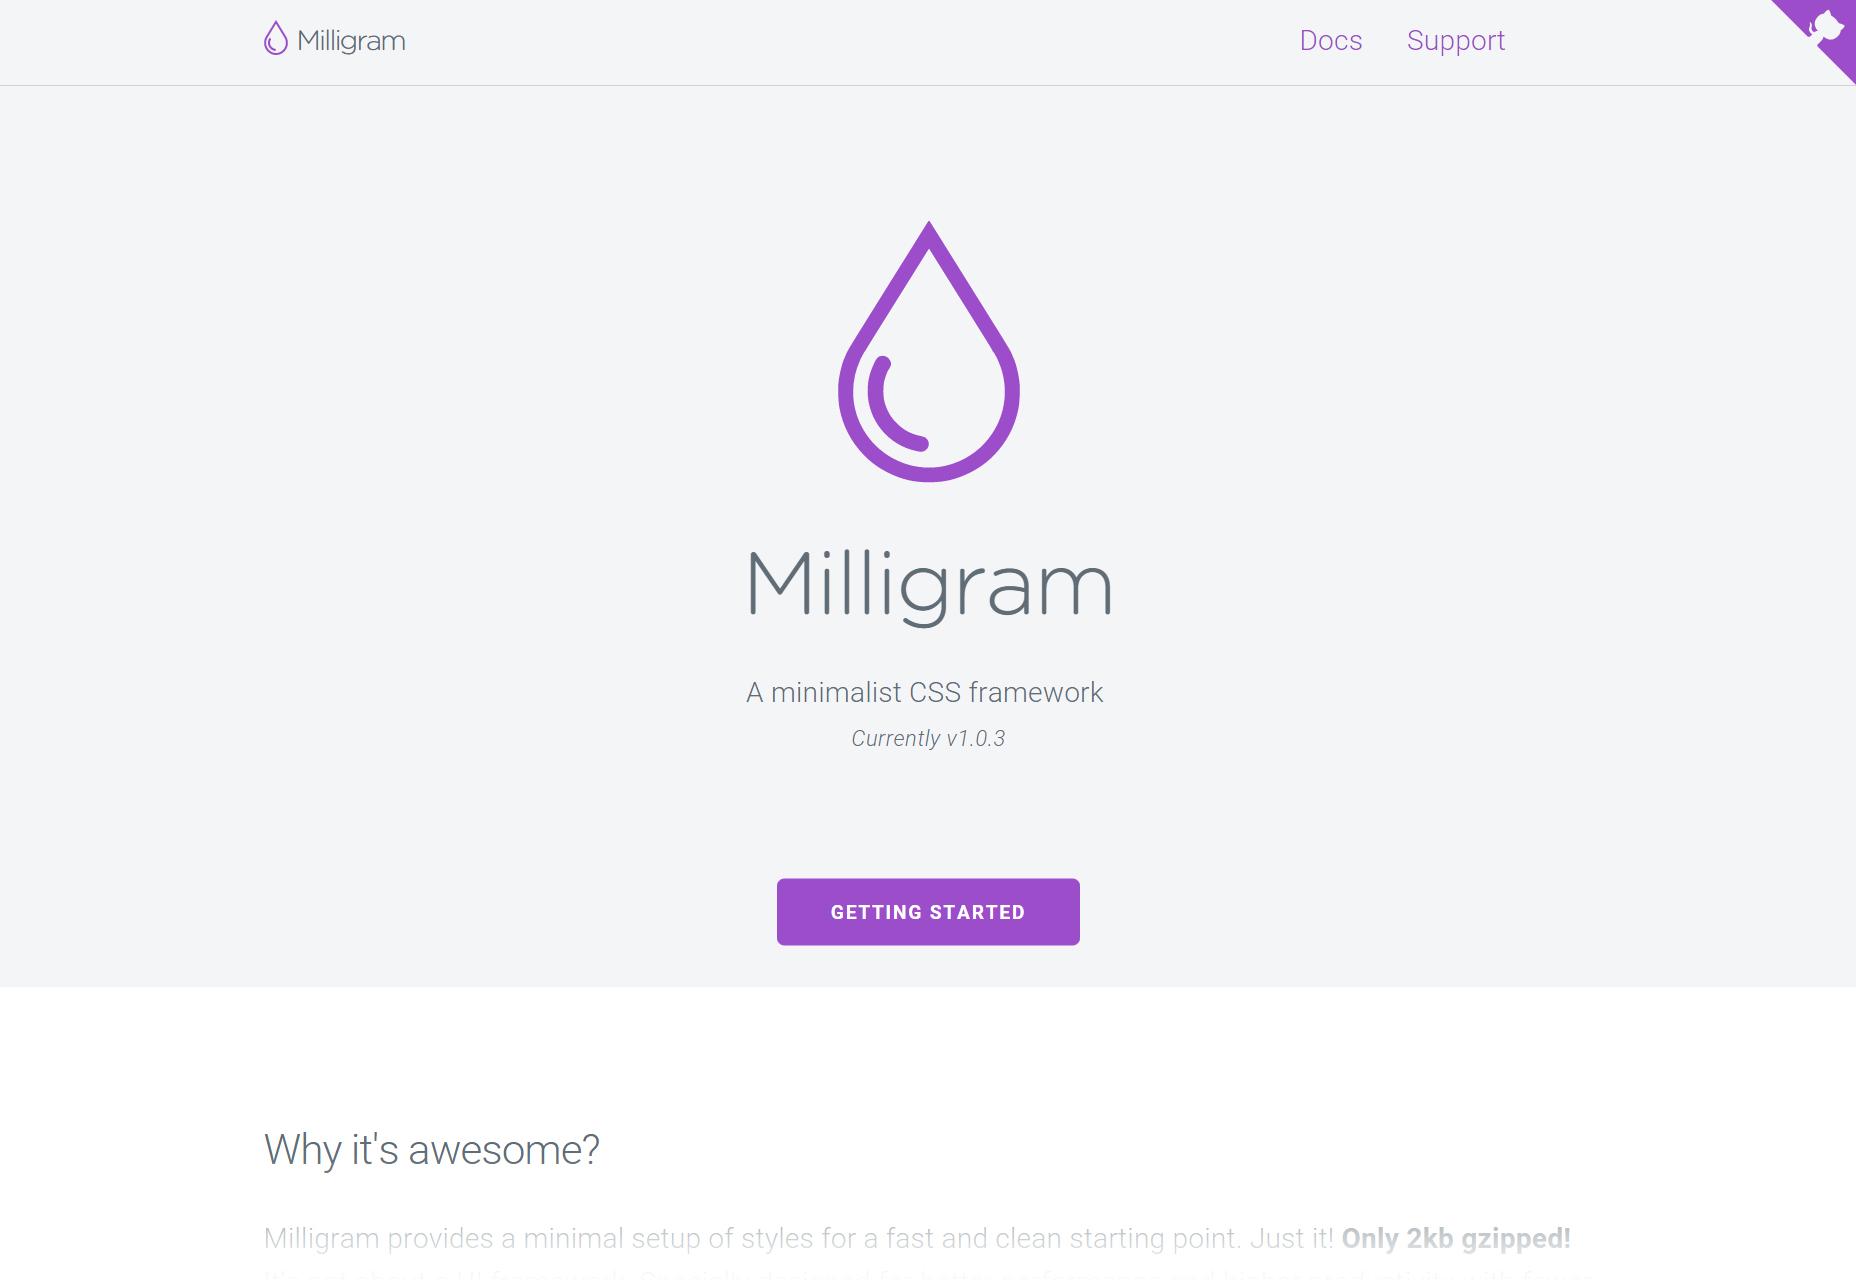 milligram-minimalist-css-framework